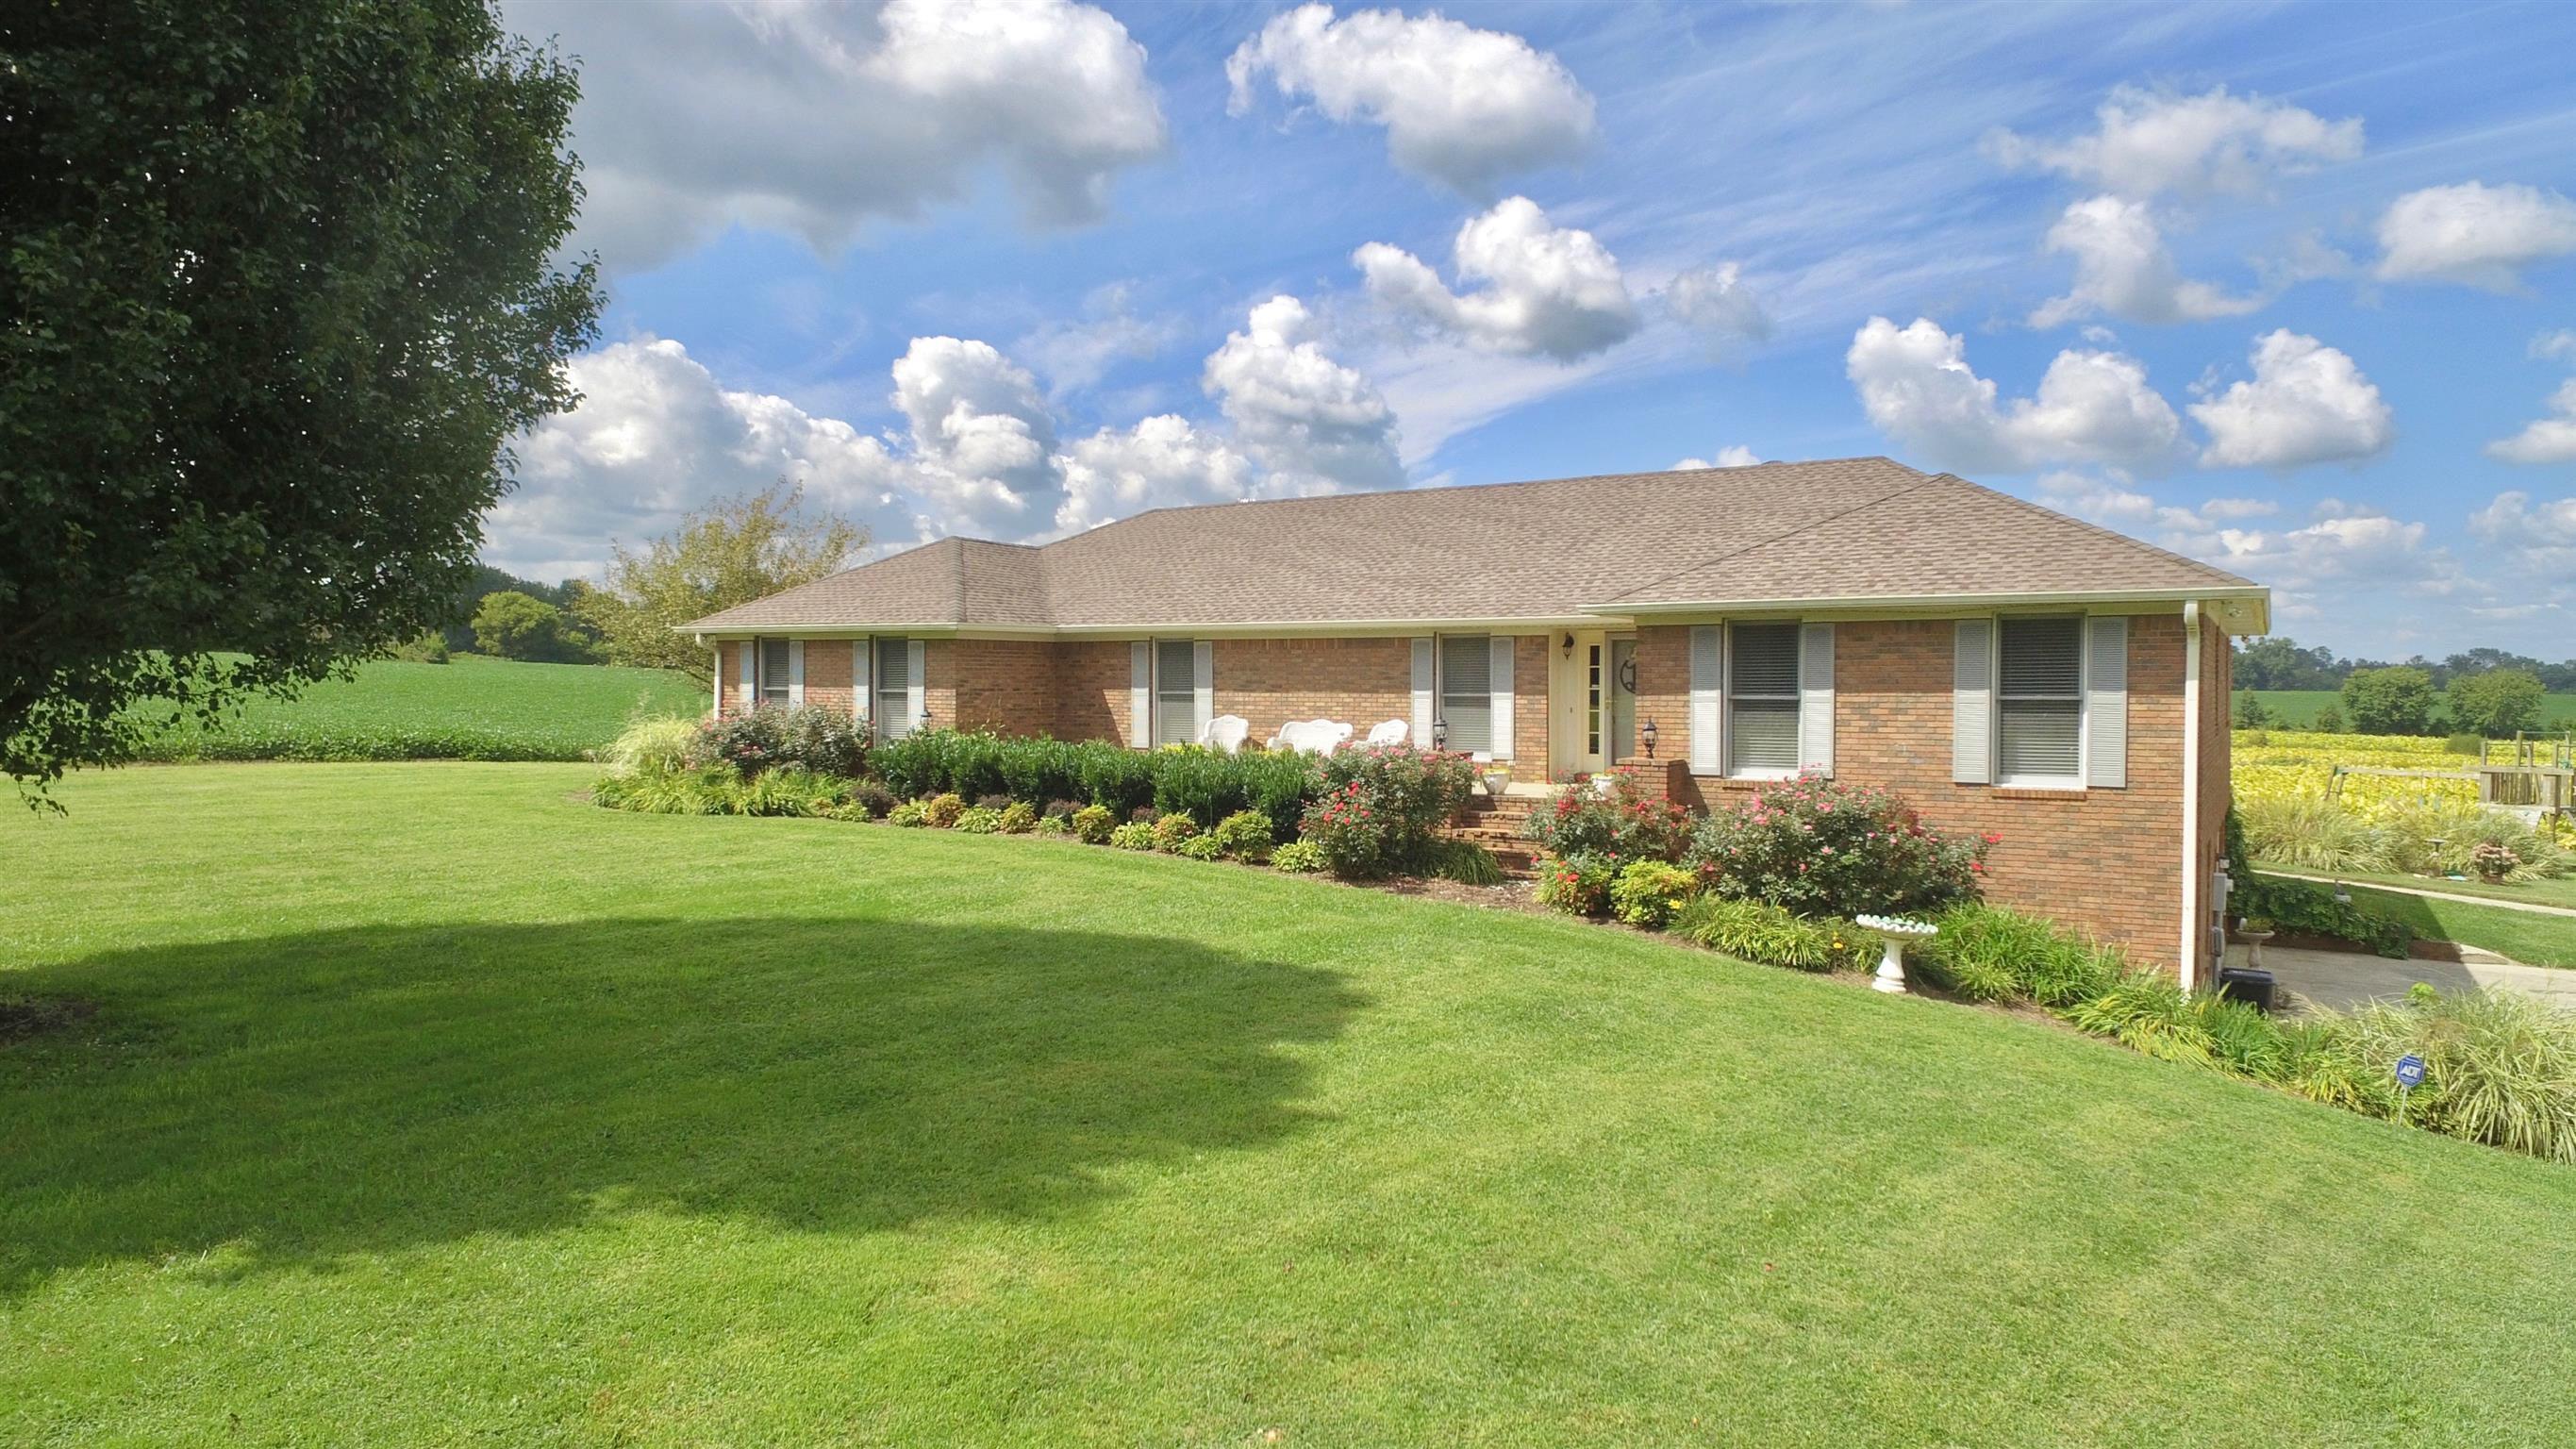 Photo of 635 Fairfield Rd  Westmoreland  TN